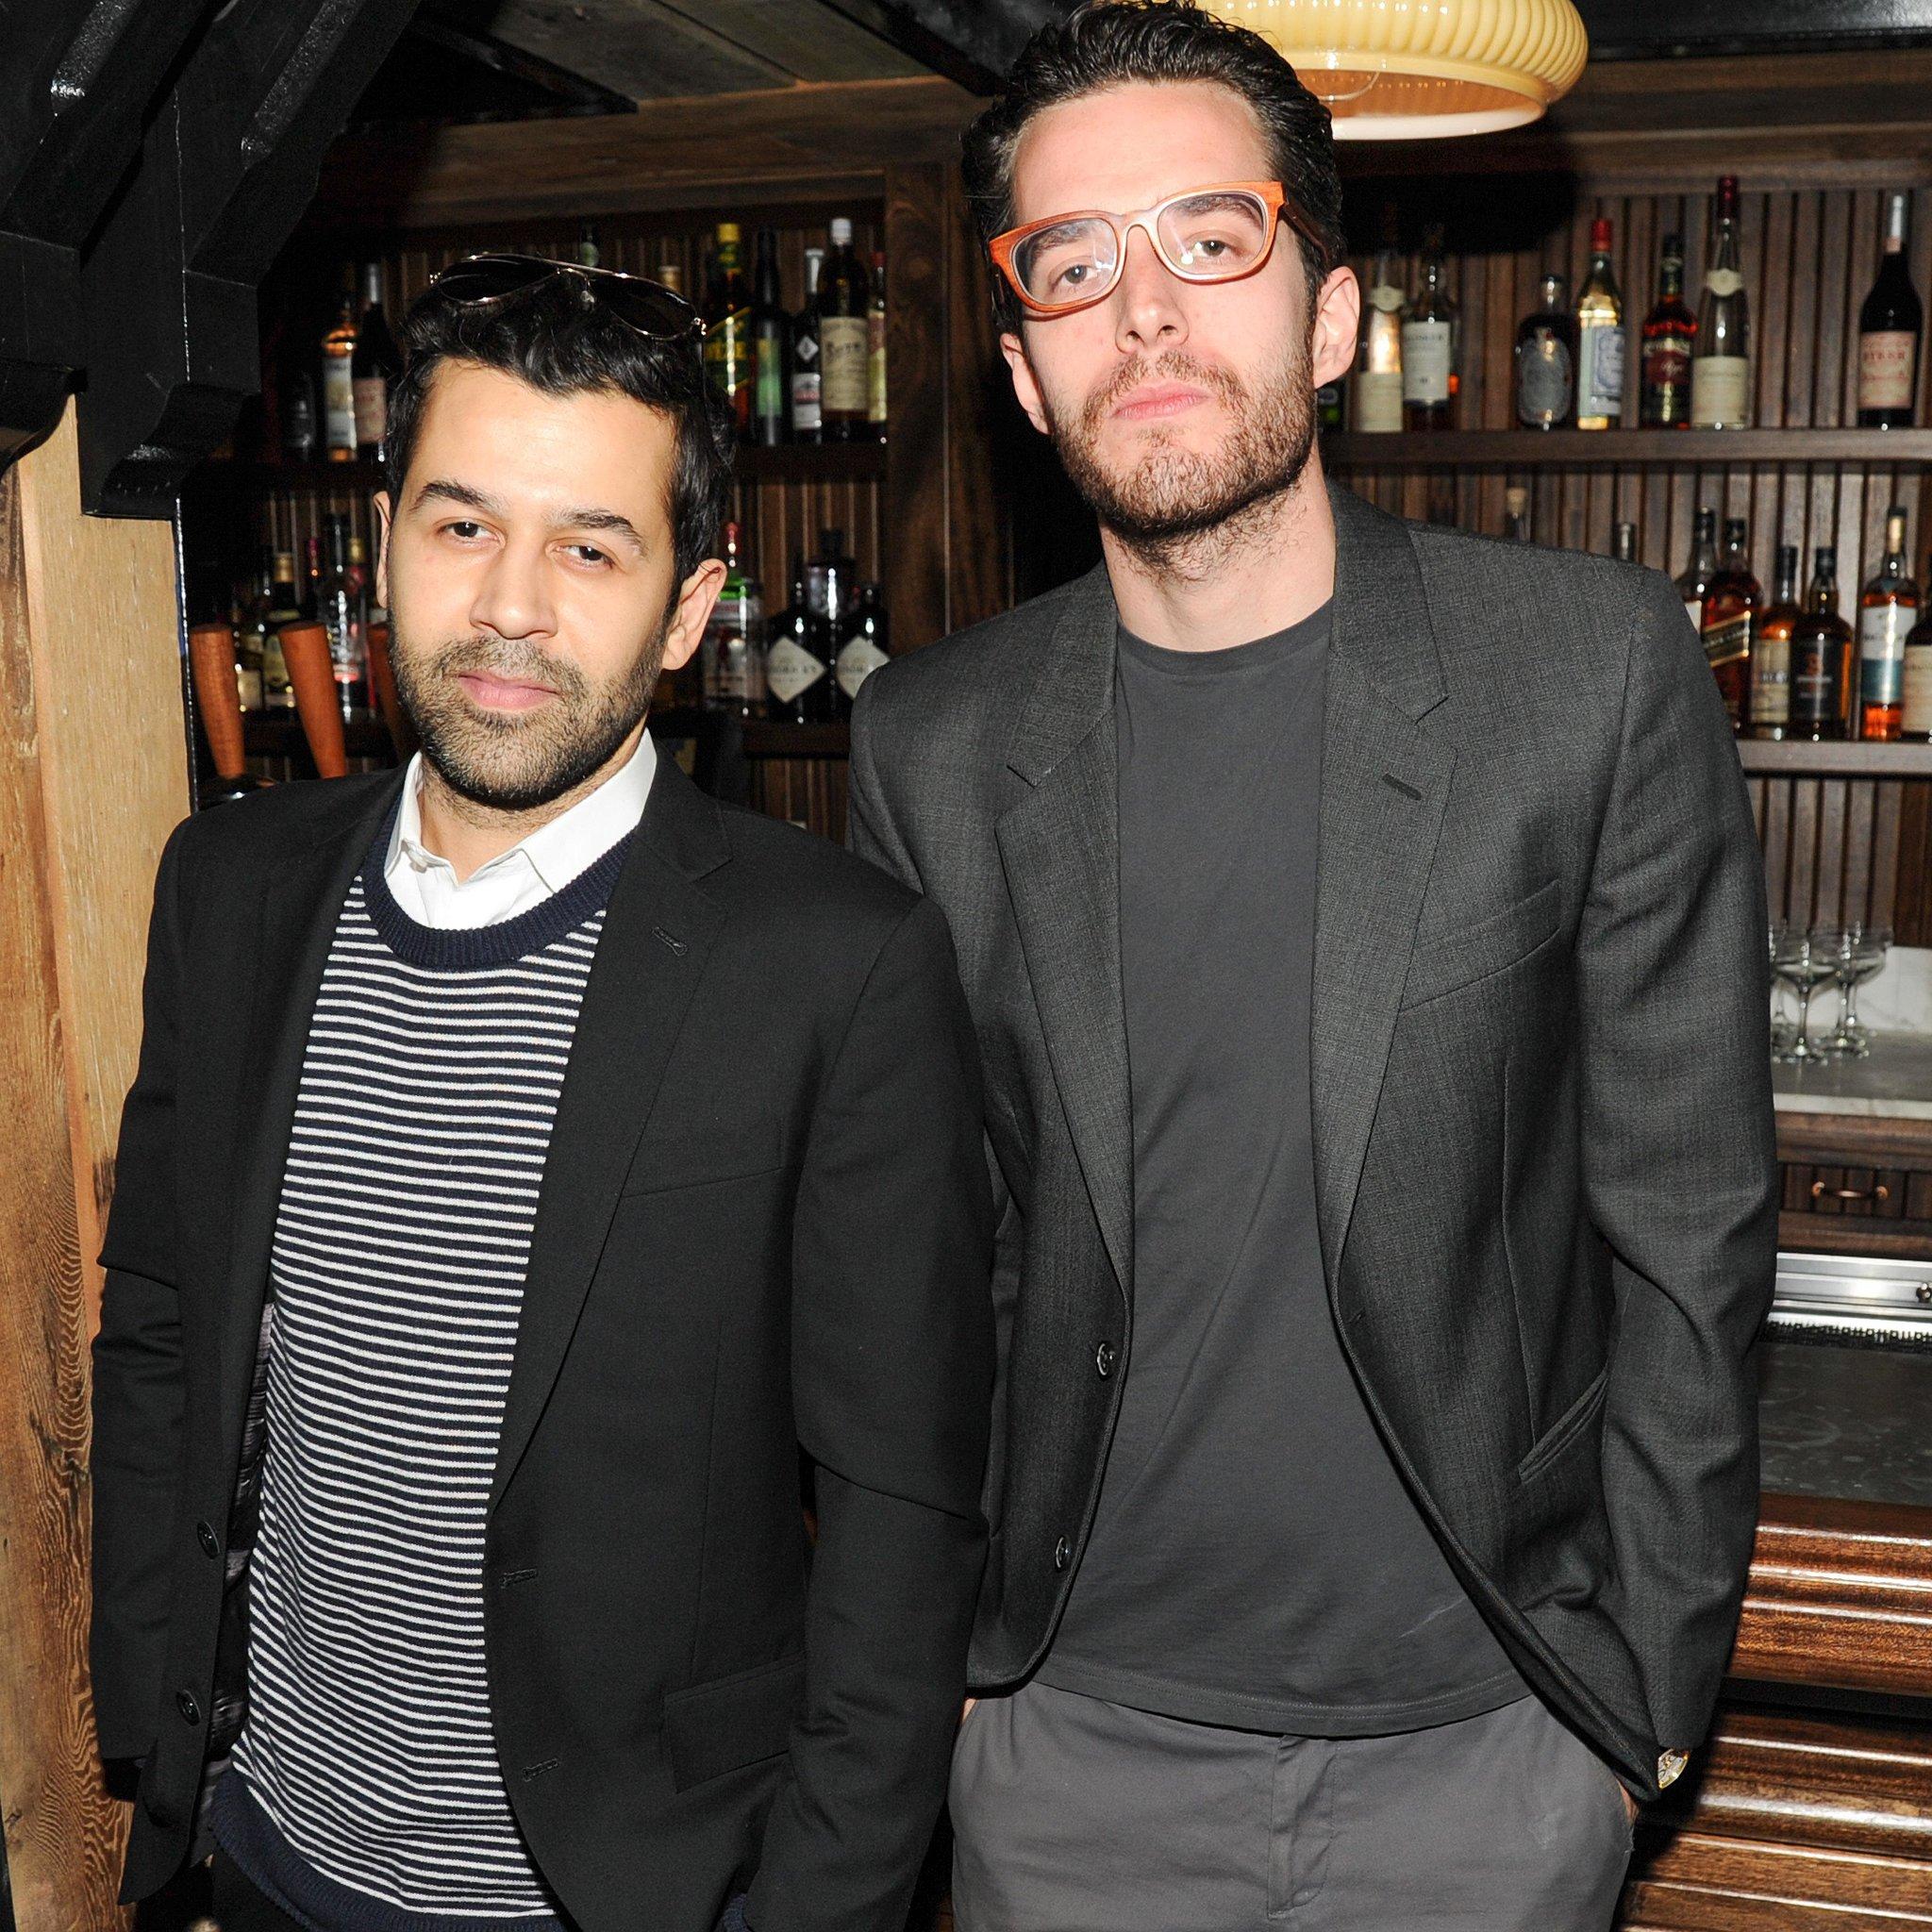 Justin Salguero and Daniel Silberman